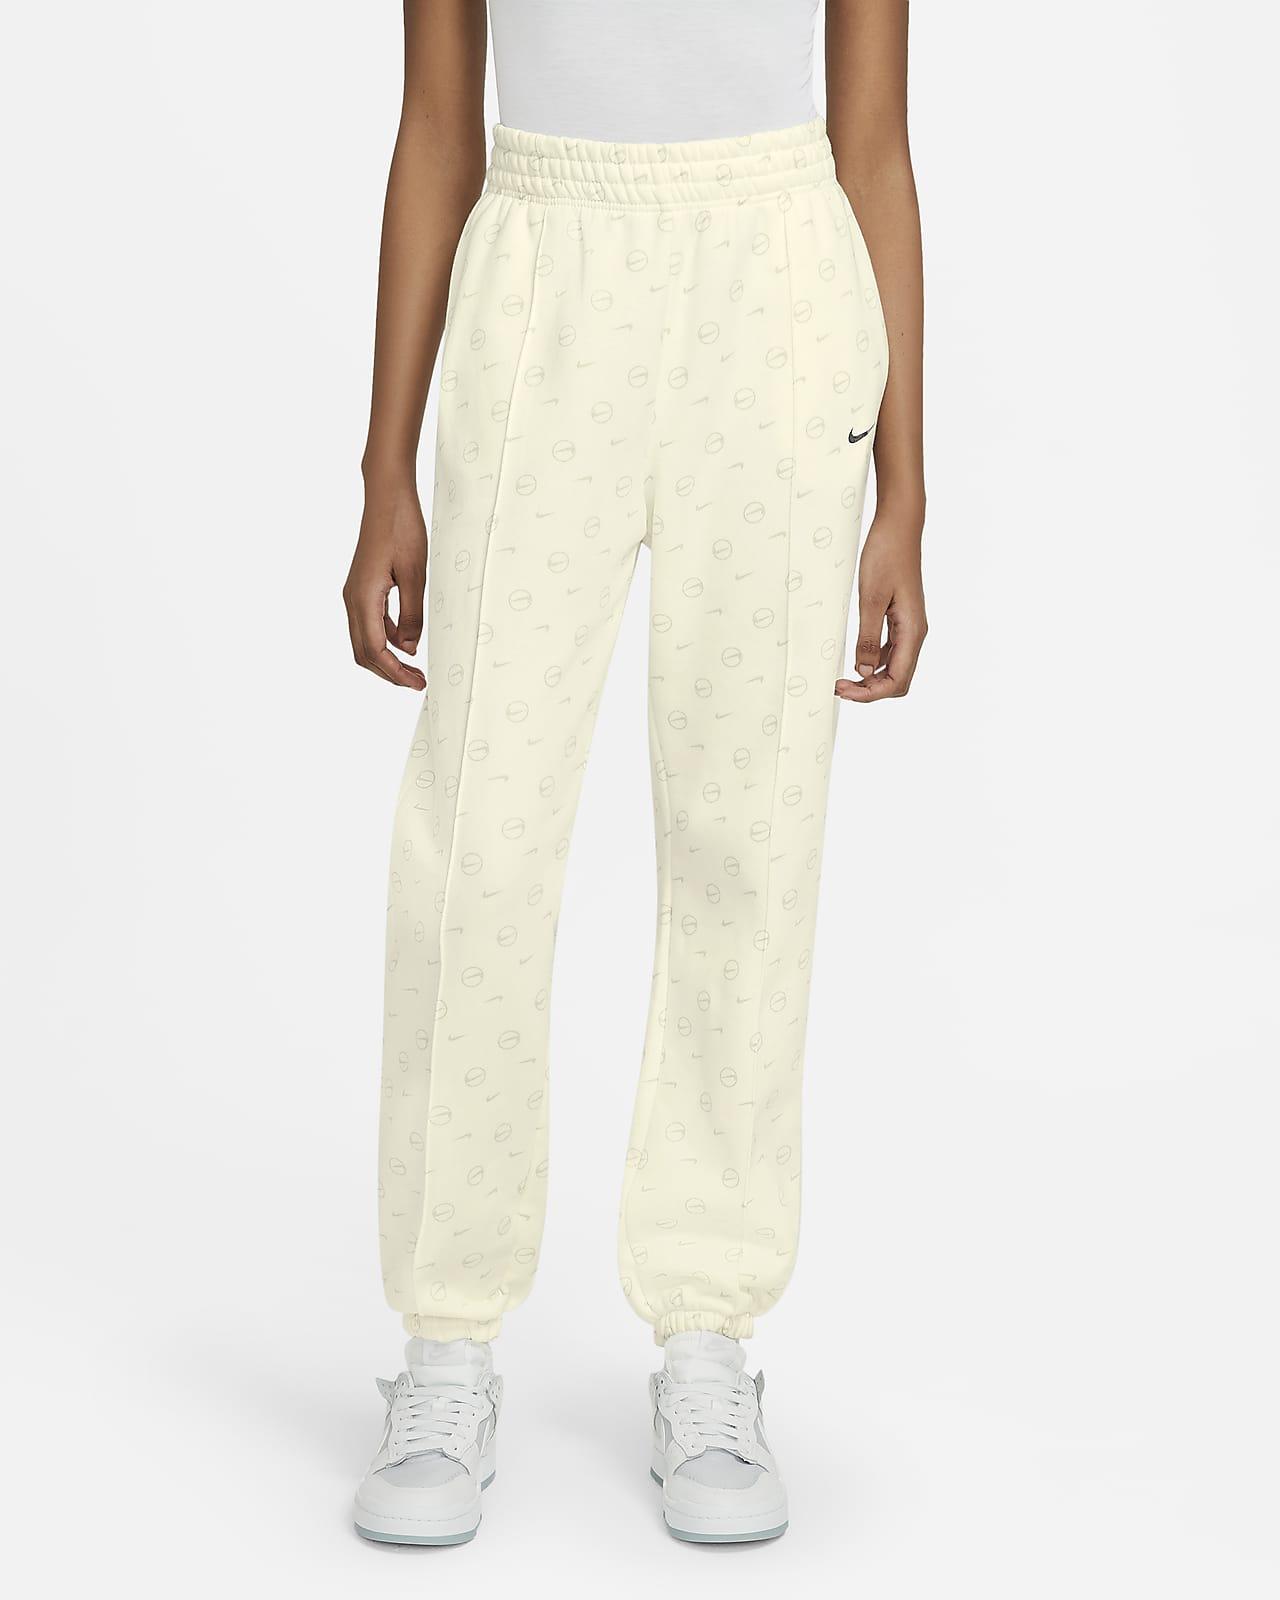 Pantalon imprimé Nike Sportswear pour Femme